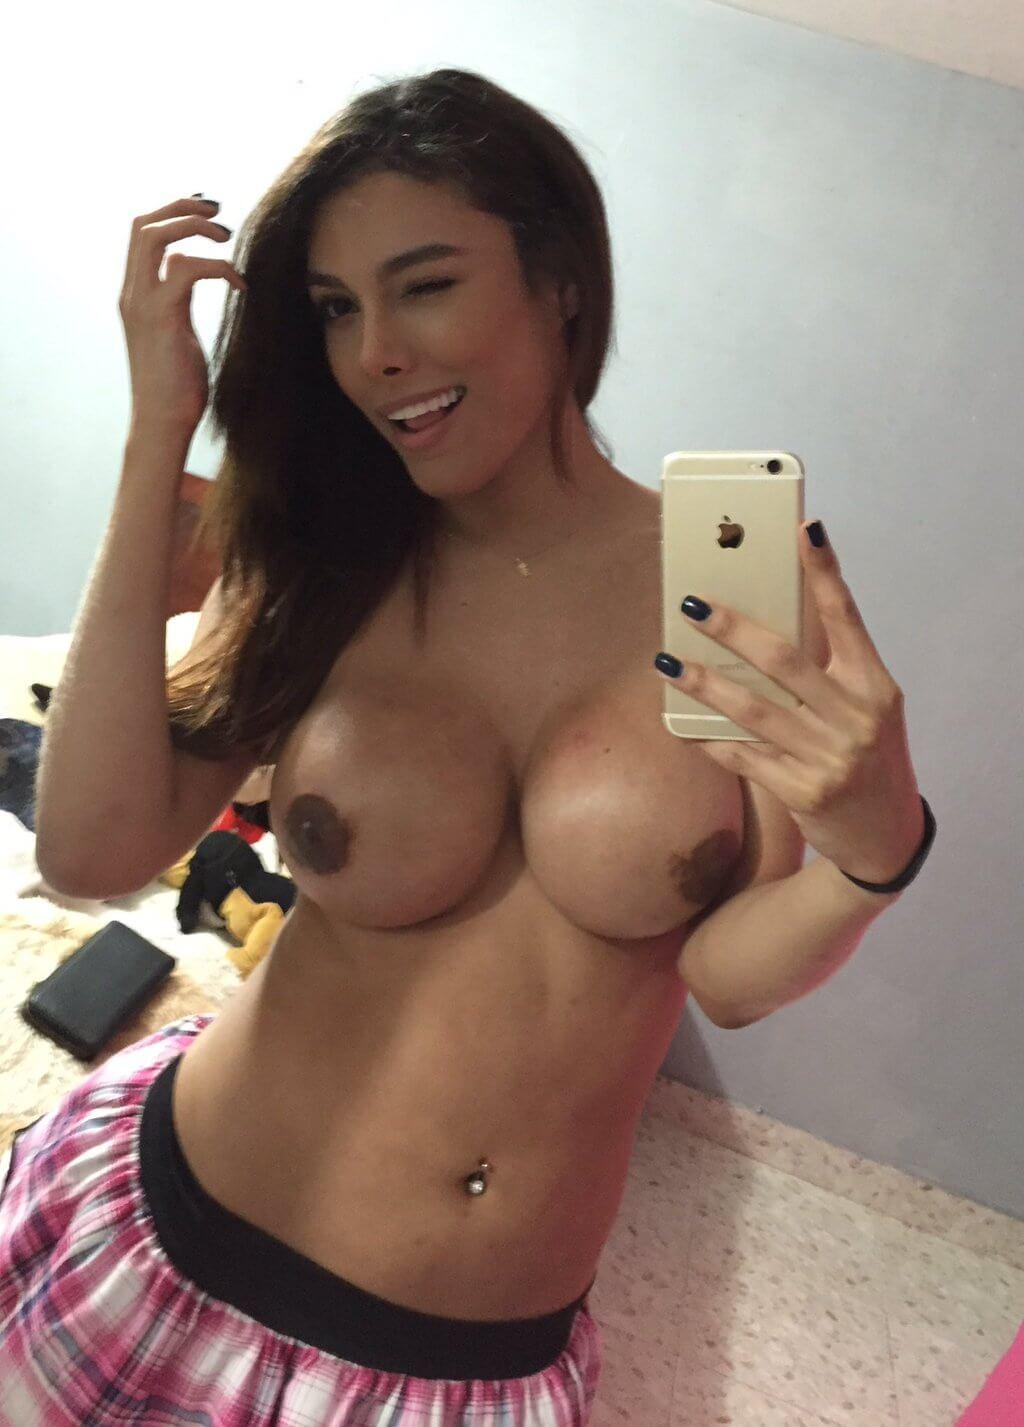 Angelica Ramirez Sexmex carolina ramirez freshxdollts pictures and porn videos 1